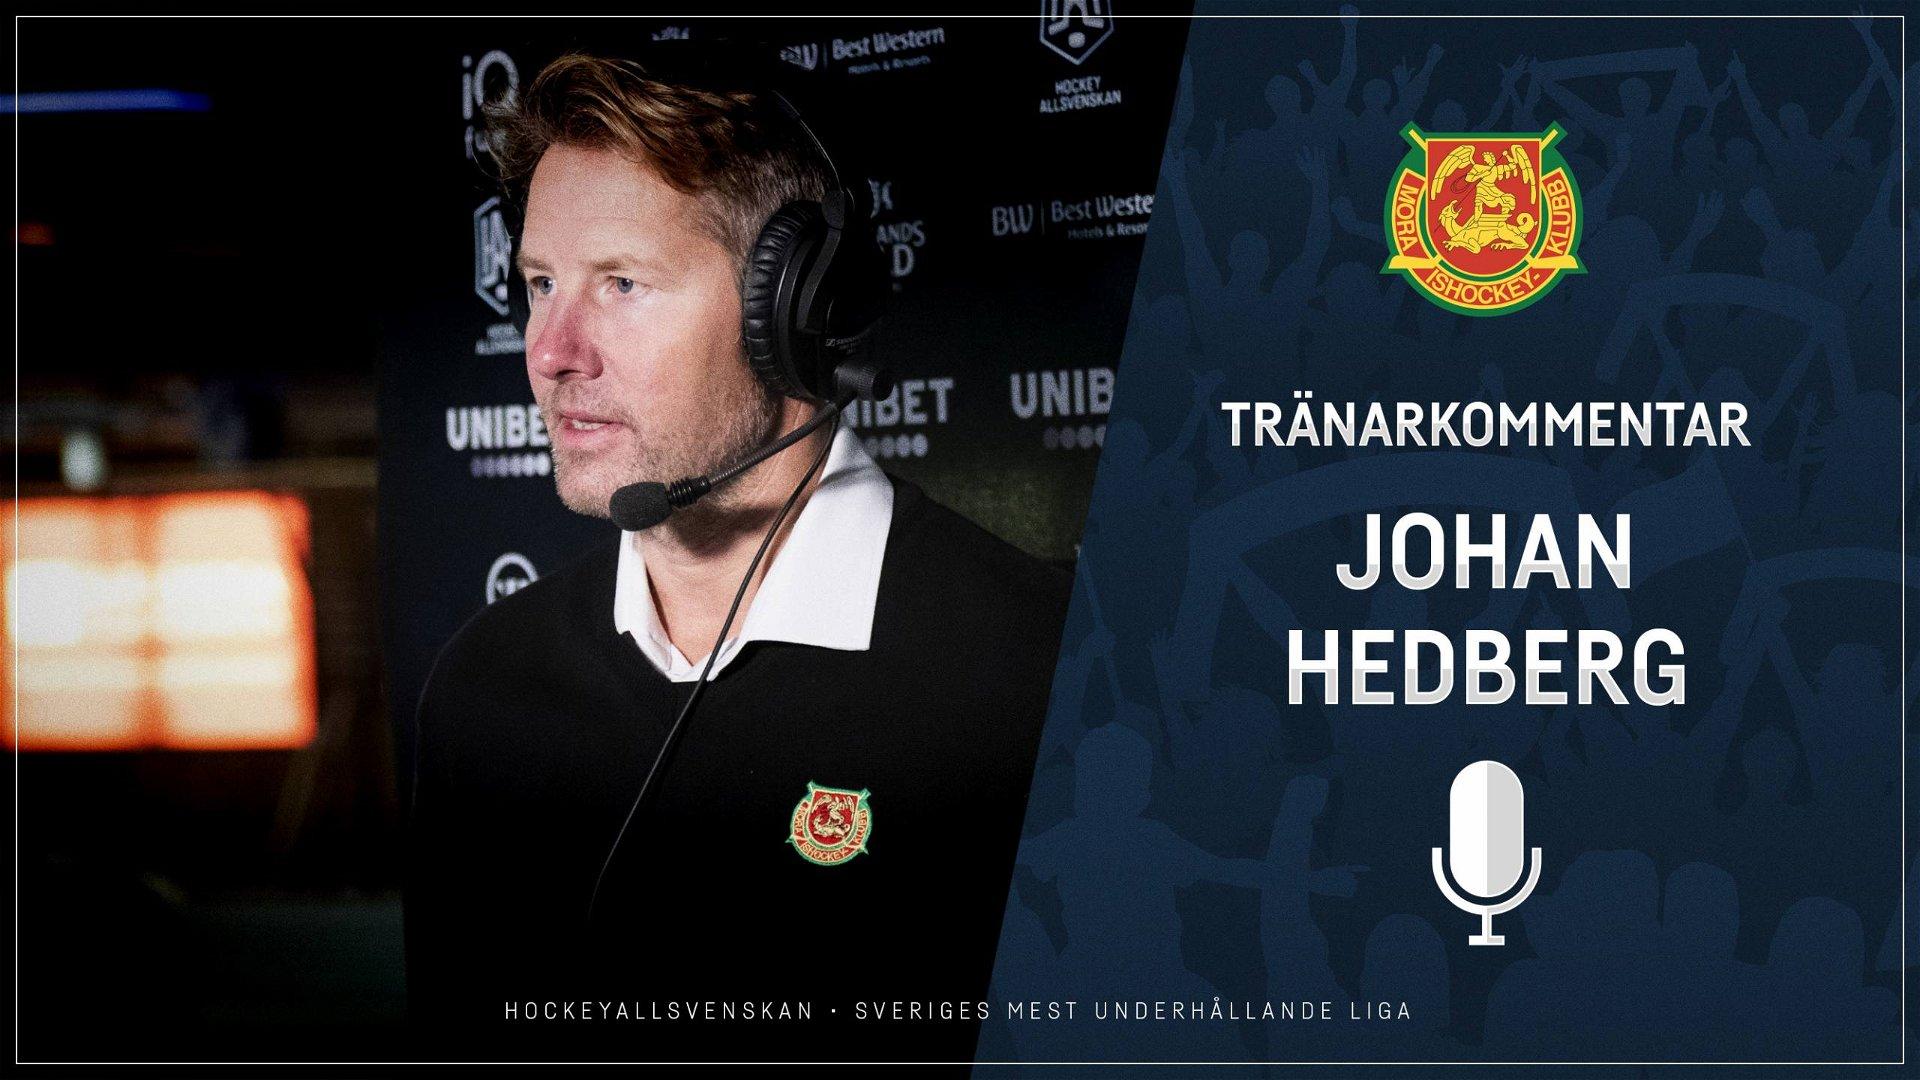 2020-12-14 Segerintervju: Johan Hedberg